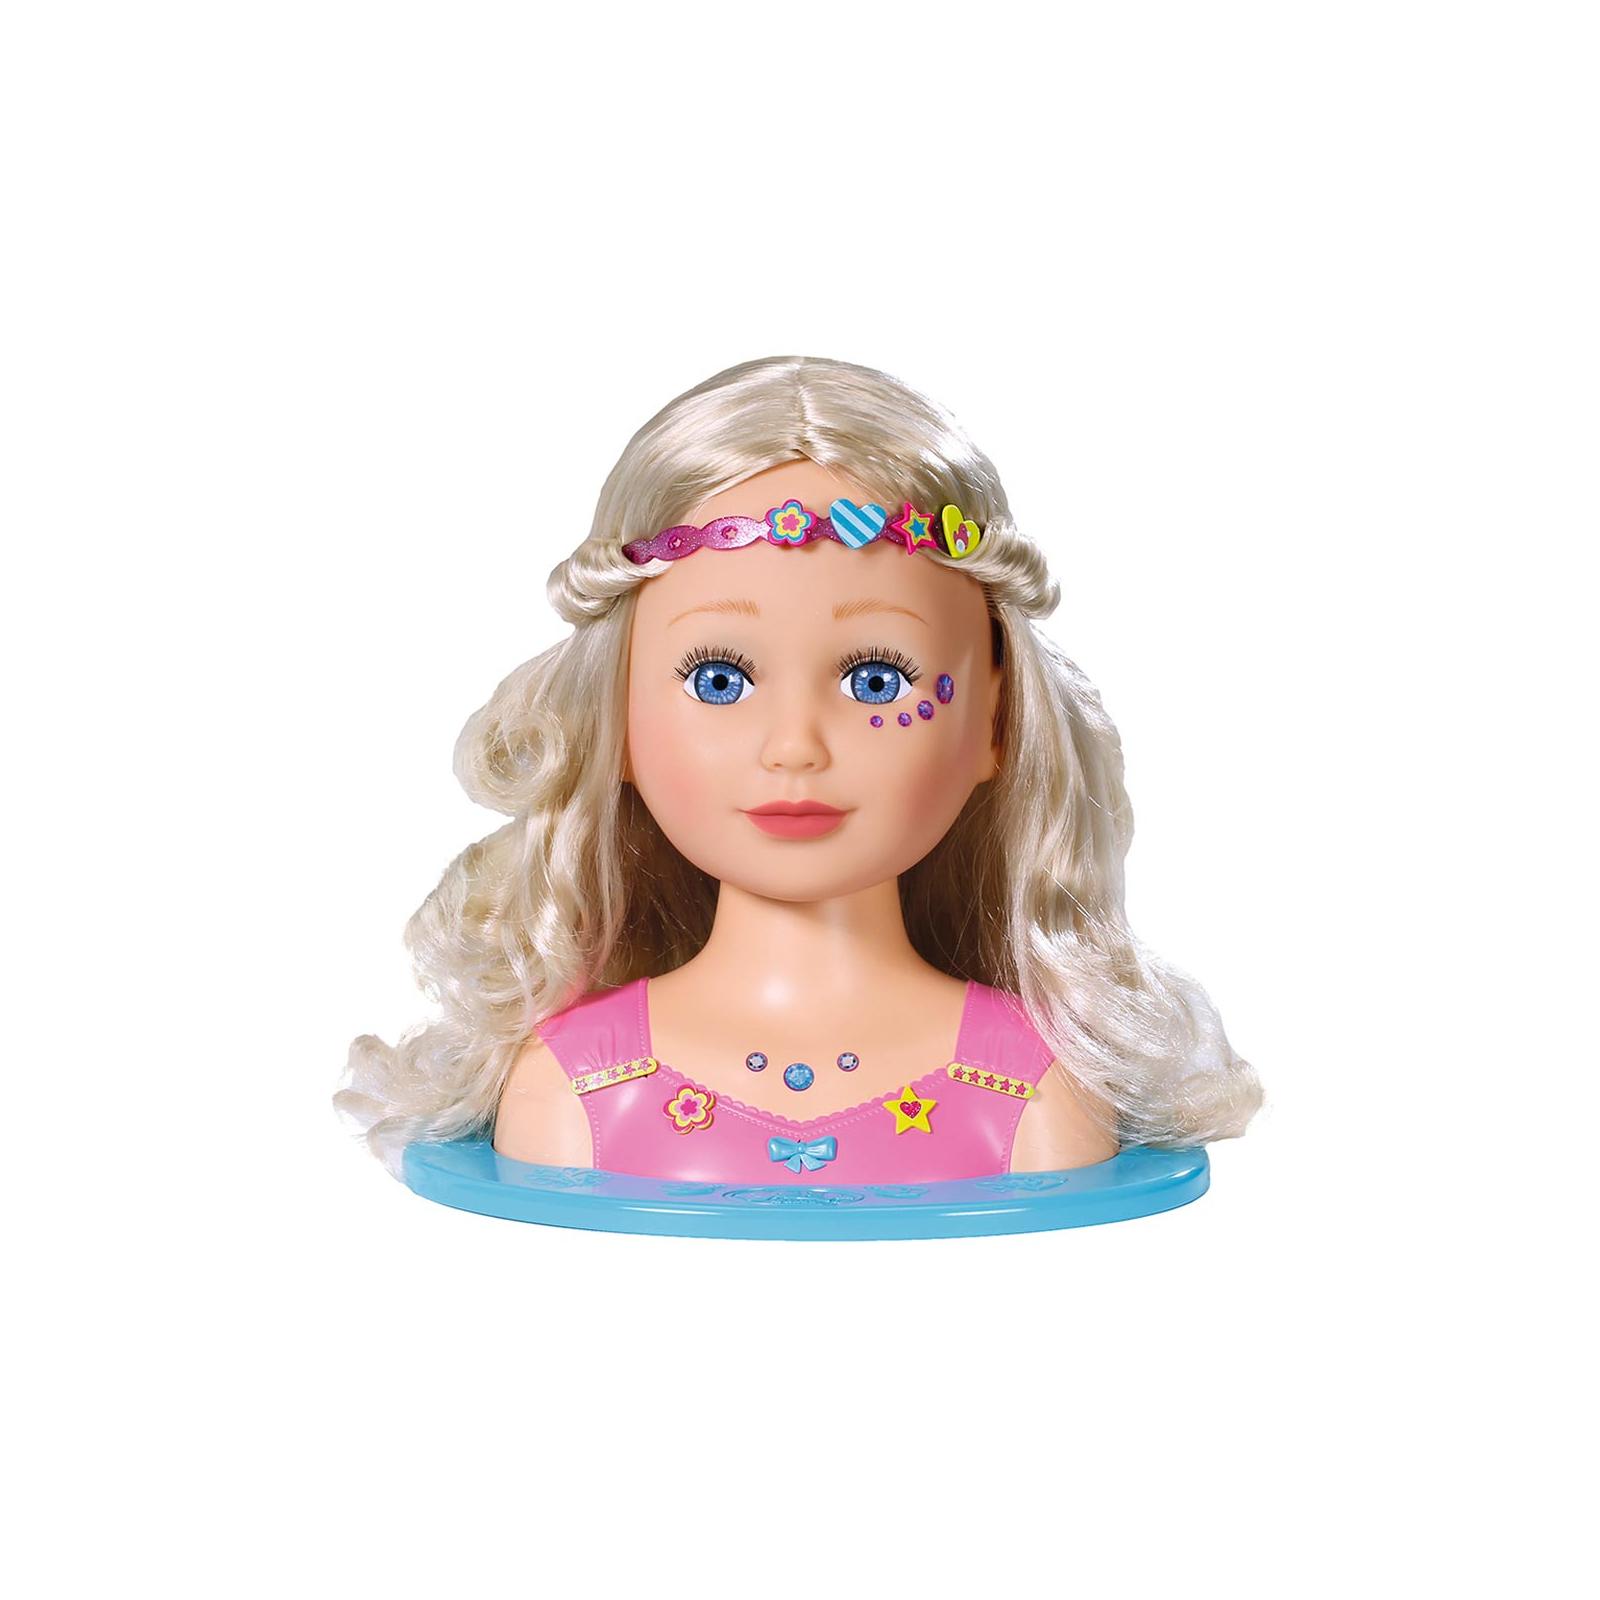 Кукла Zapf манекен My Model Сестричка с аксессуарами (824788) изображение 3